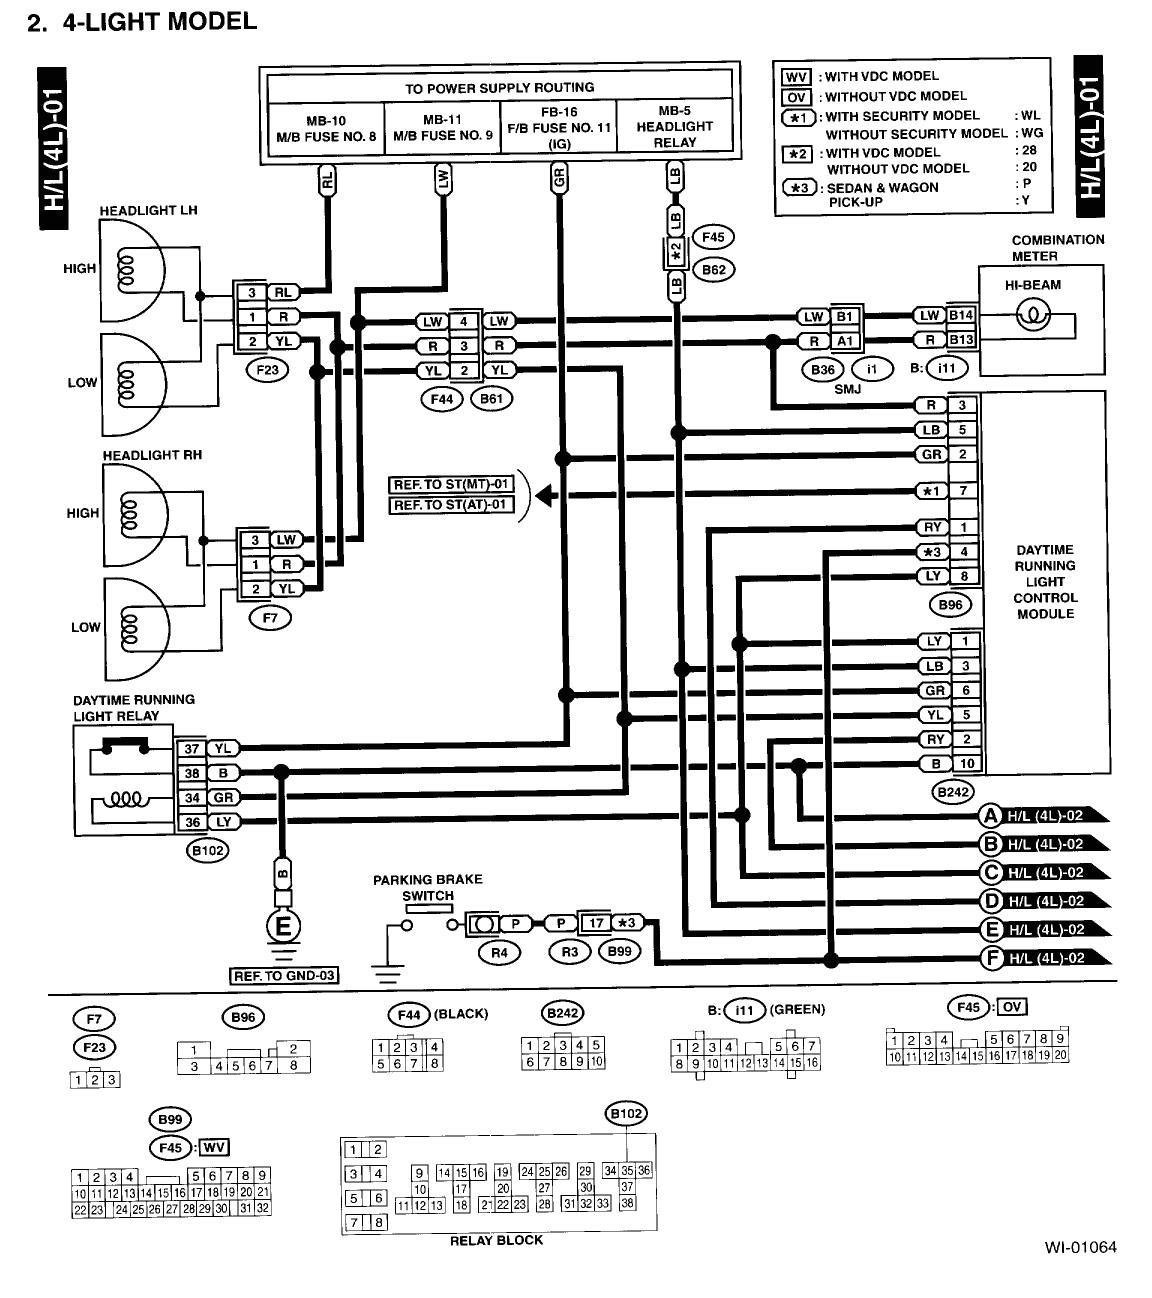 outback wiring diagram wiring diagram database mix subaru outback wiring diagram